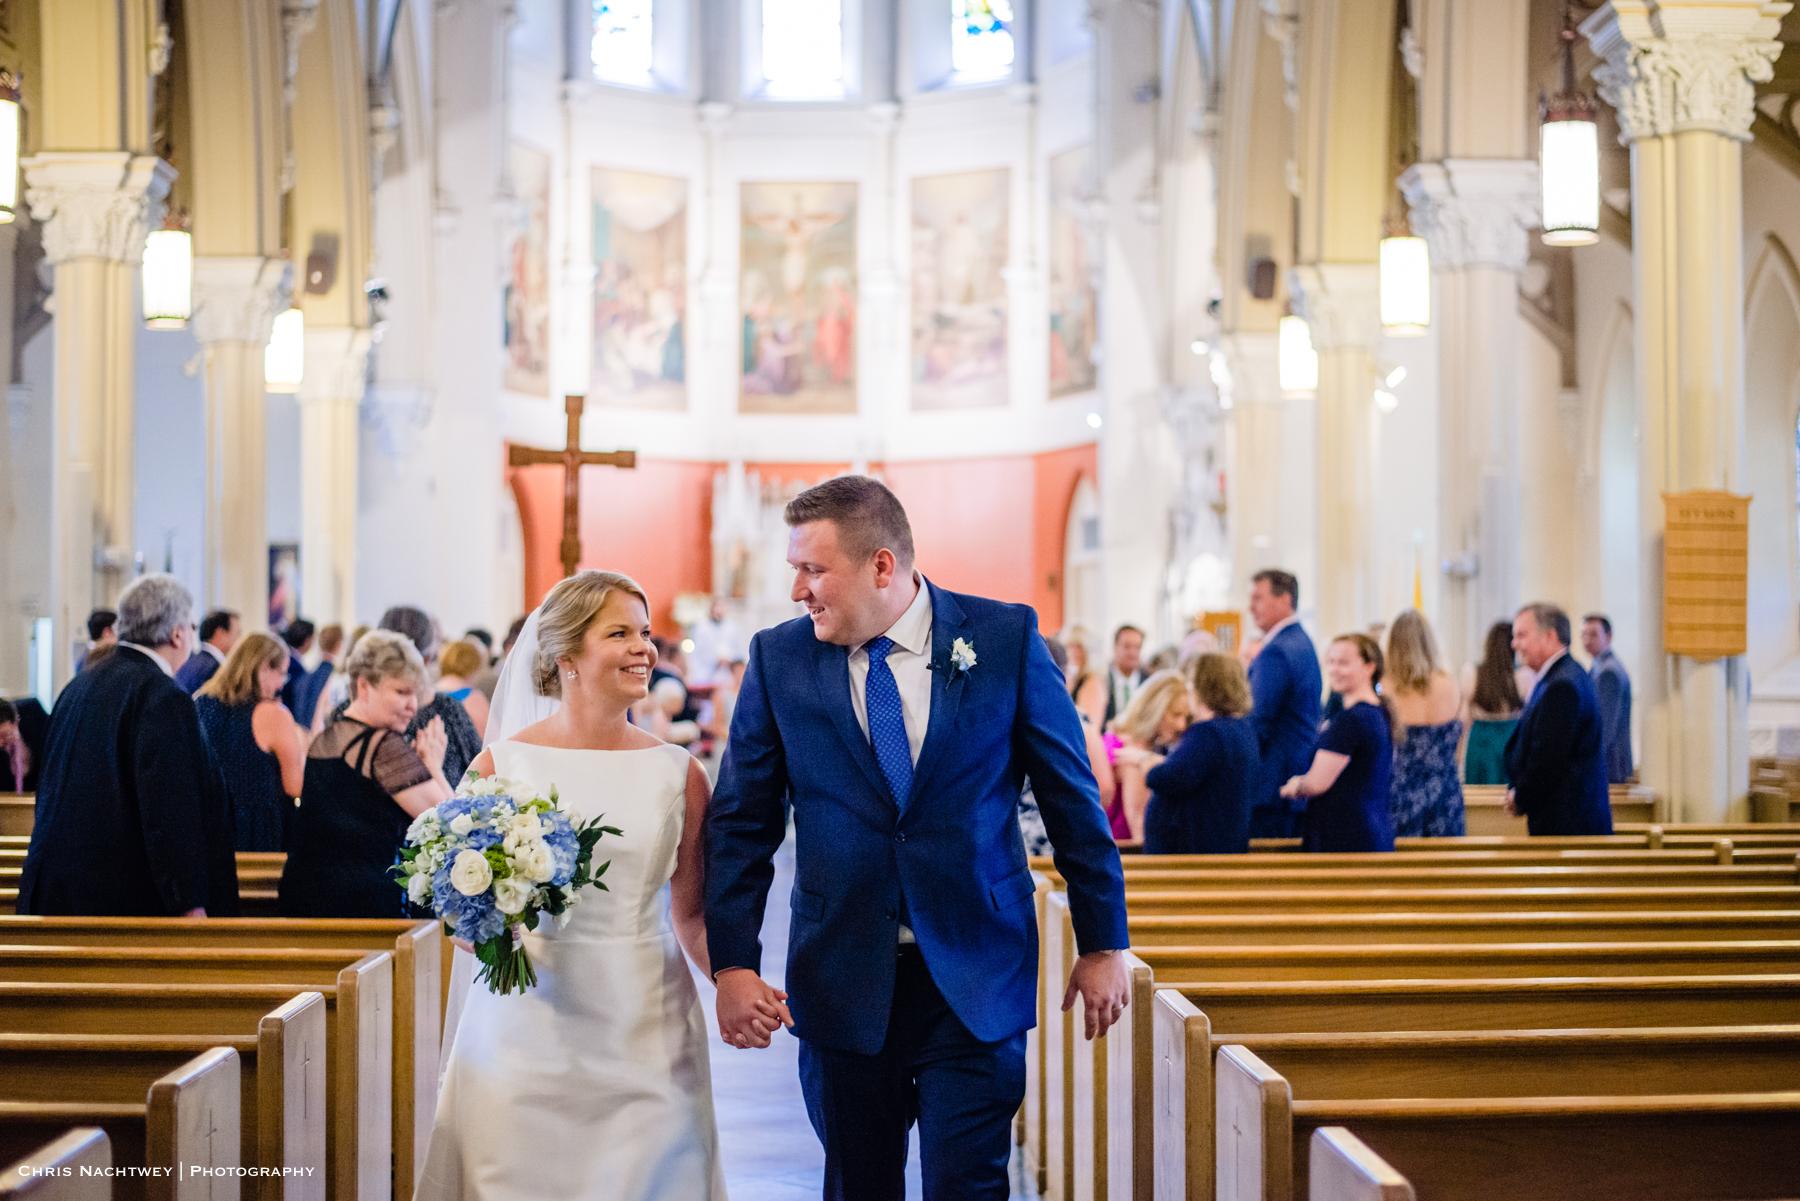 photos-wedding-haley-mansion-mystic-ct-chris-nachtwey-photography-2019-16.jpg